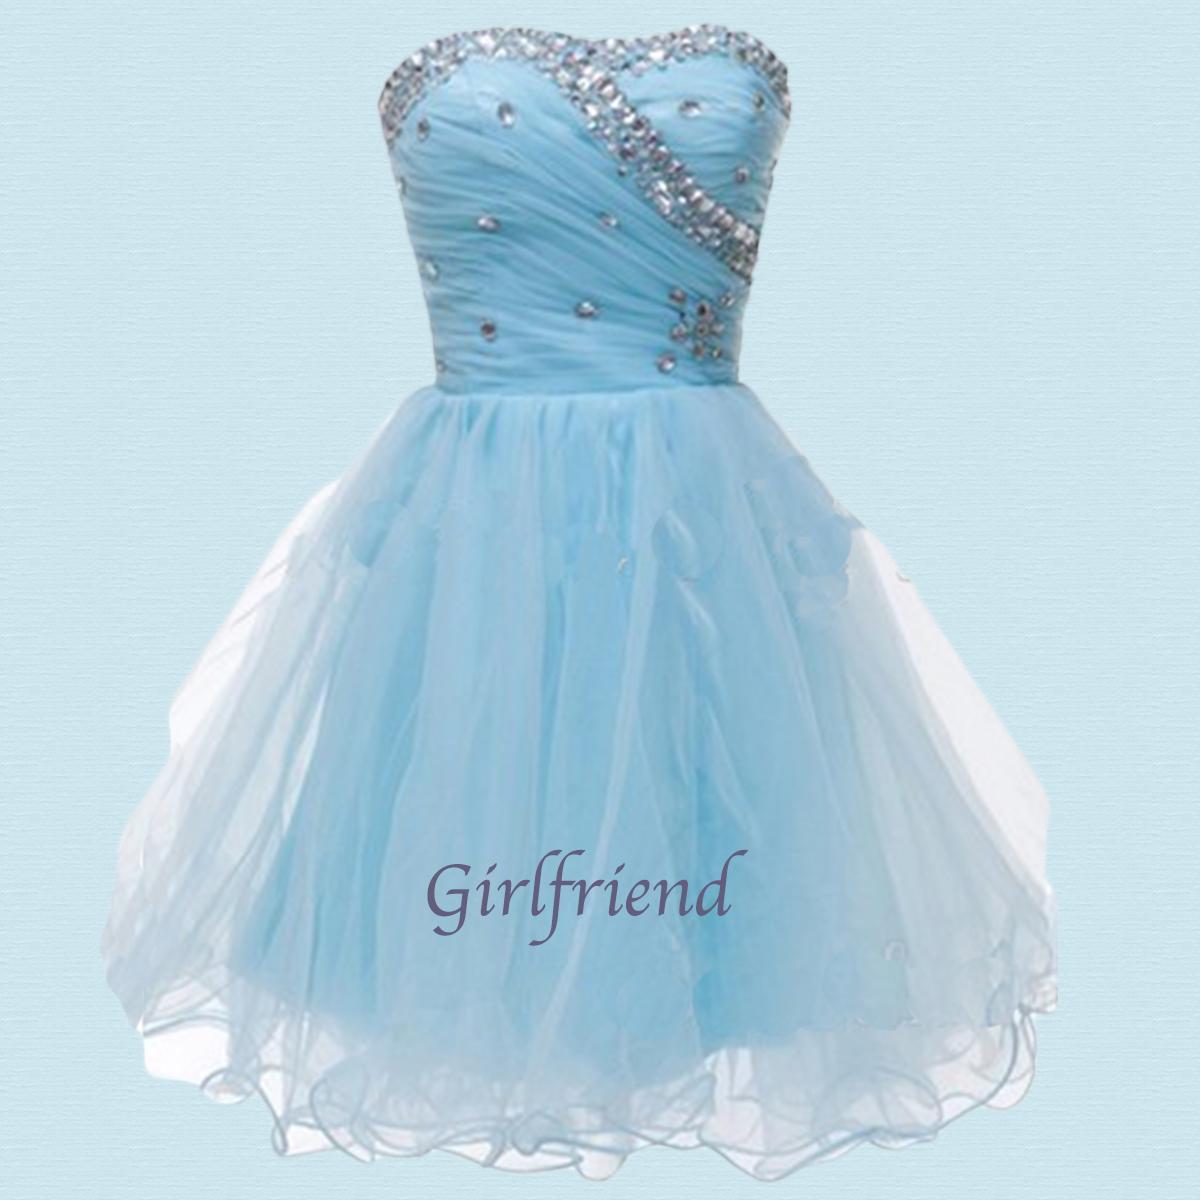 Pin Cute Formal Dresses Tumblr on Pinterest